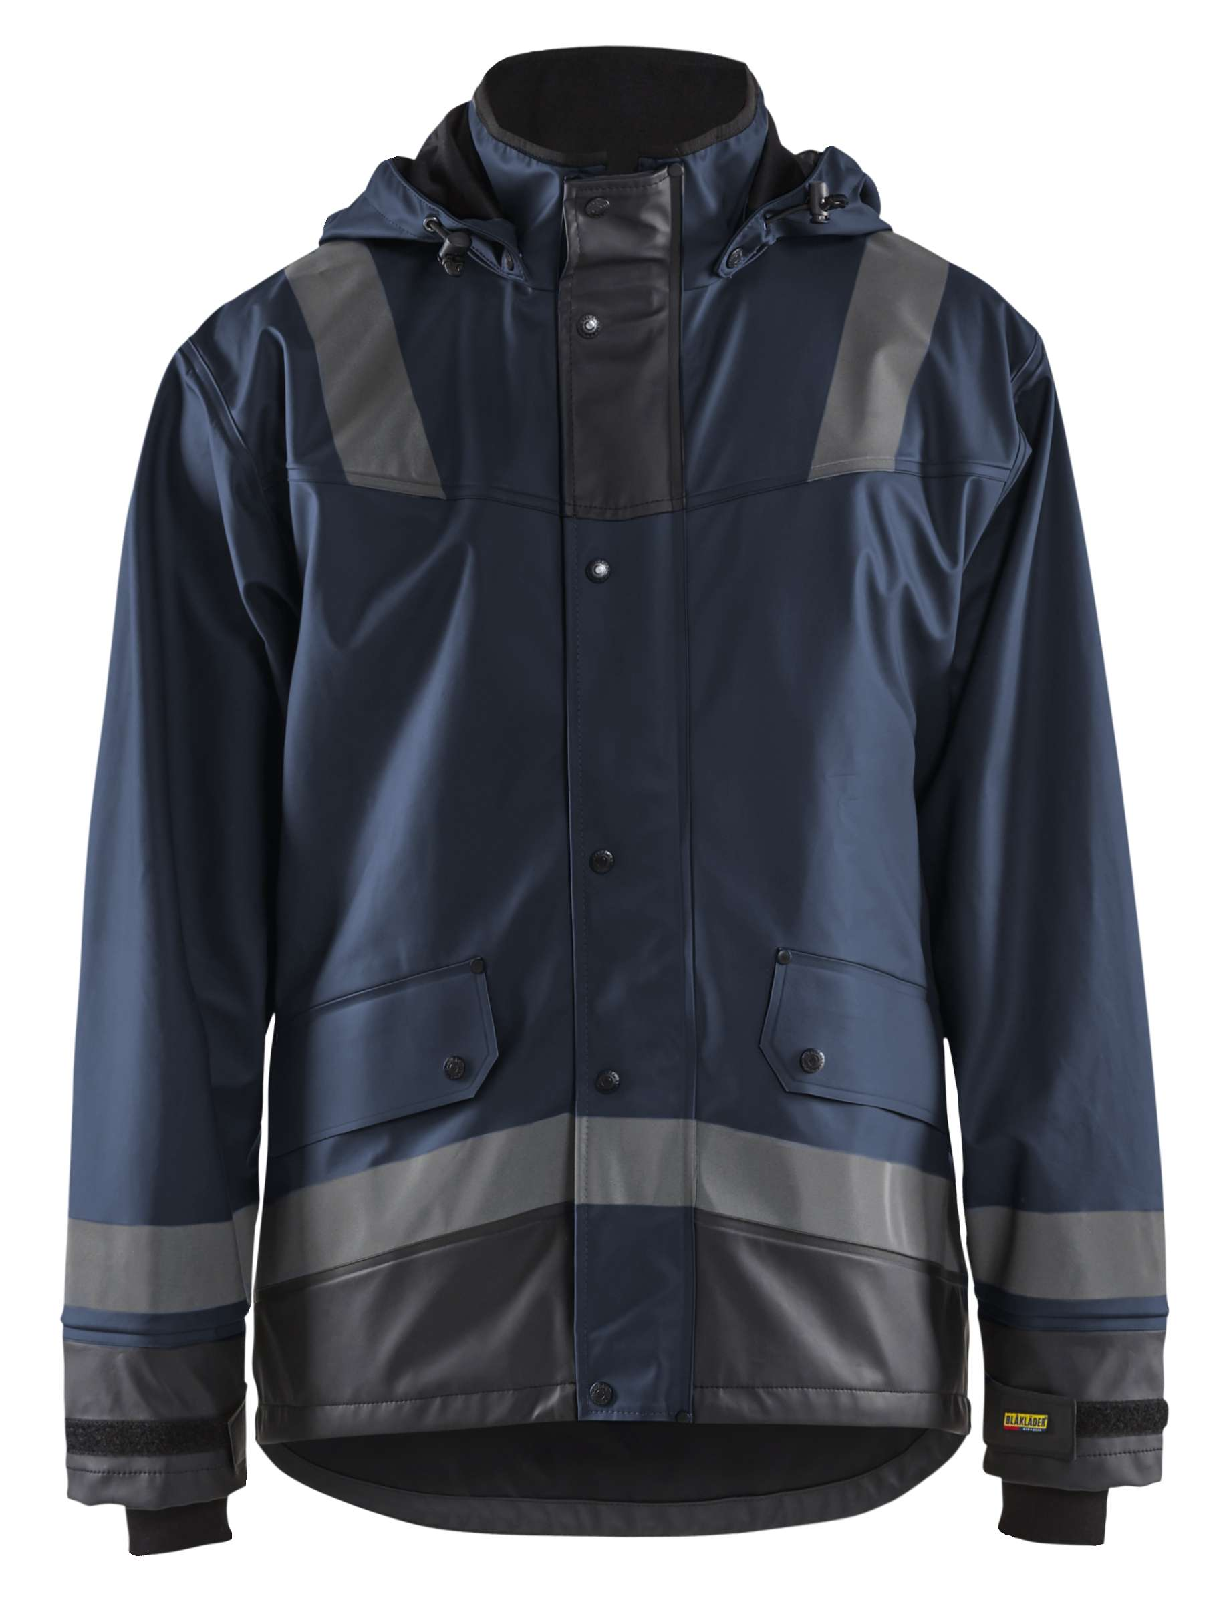 Blaklader Regenjassen 43222003 donker marineblauw-zwart(8699)